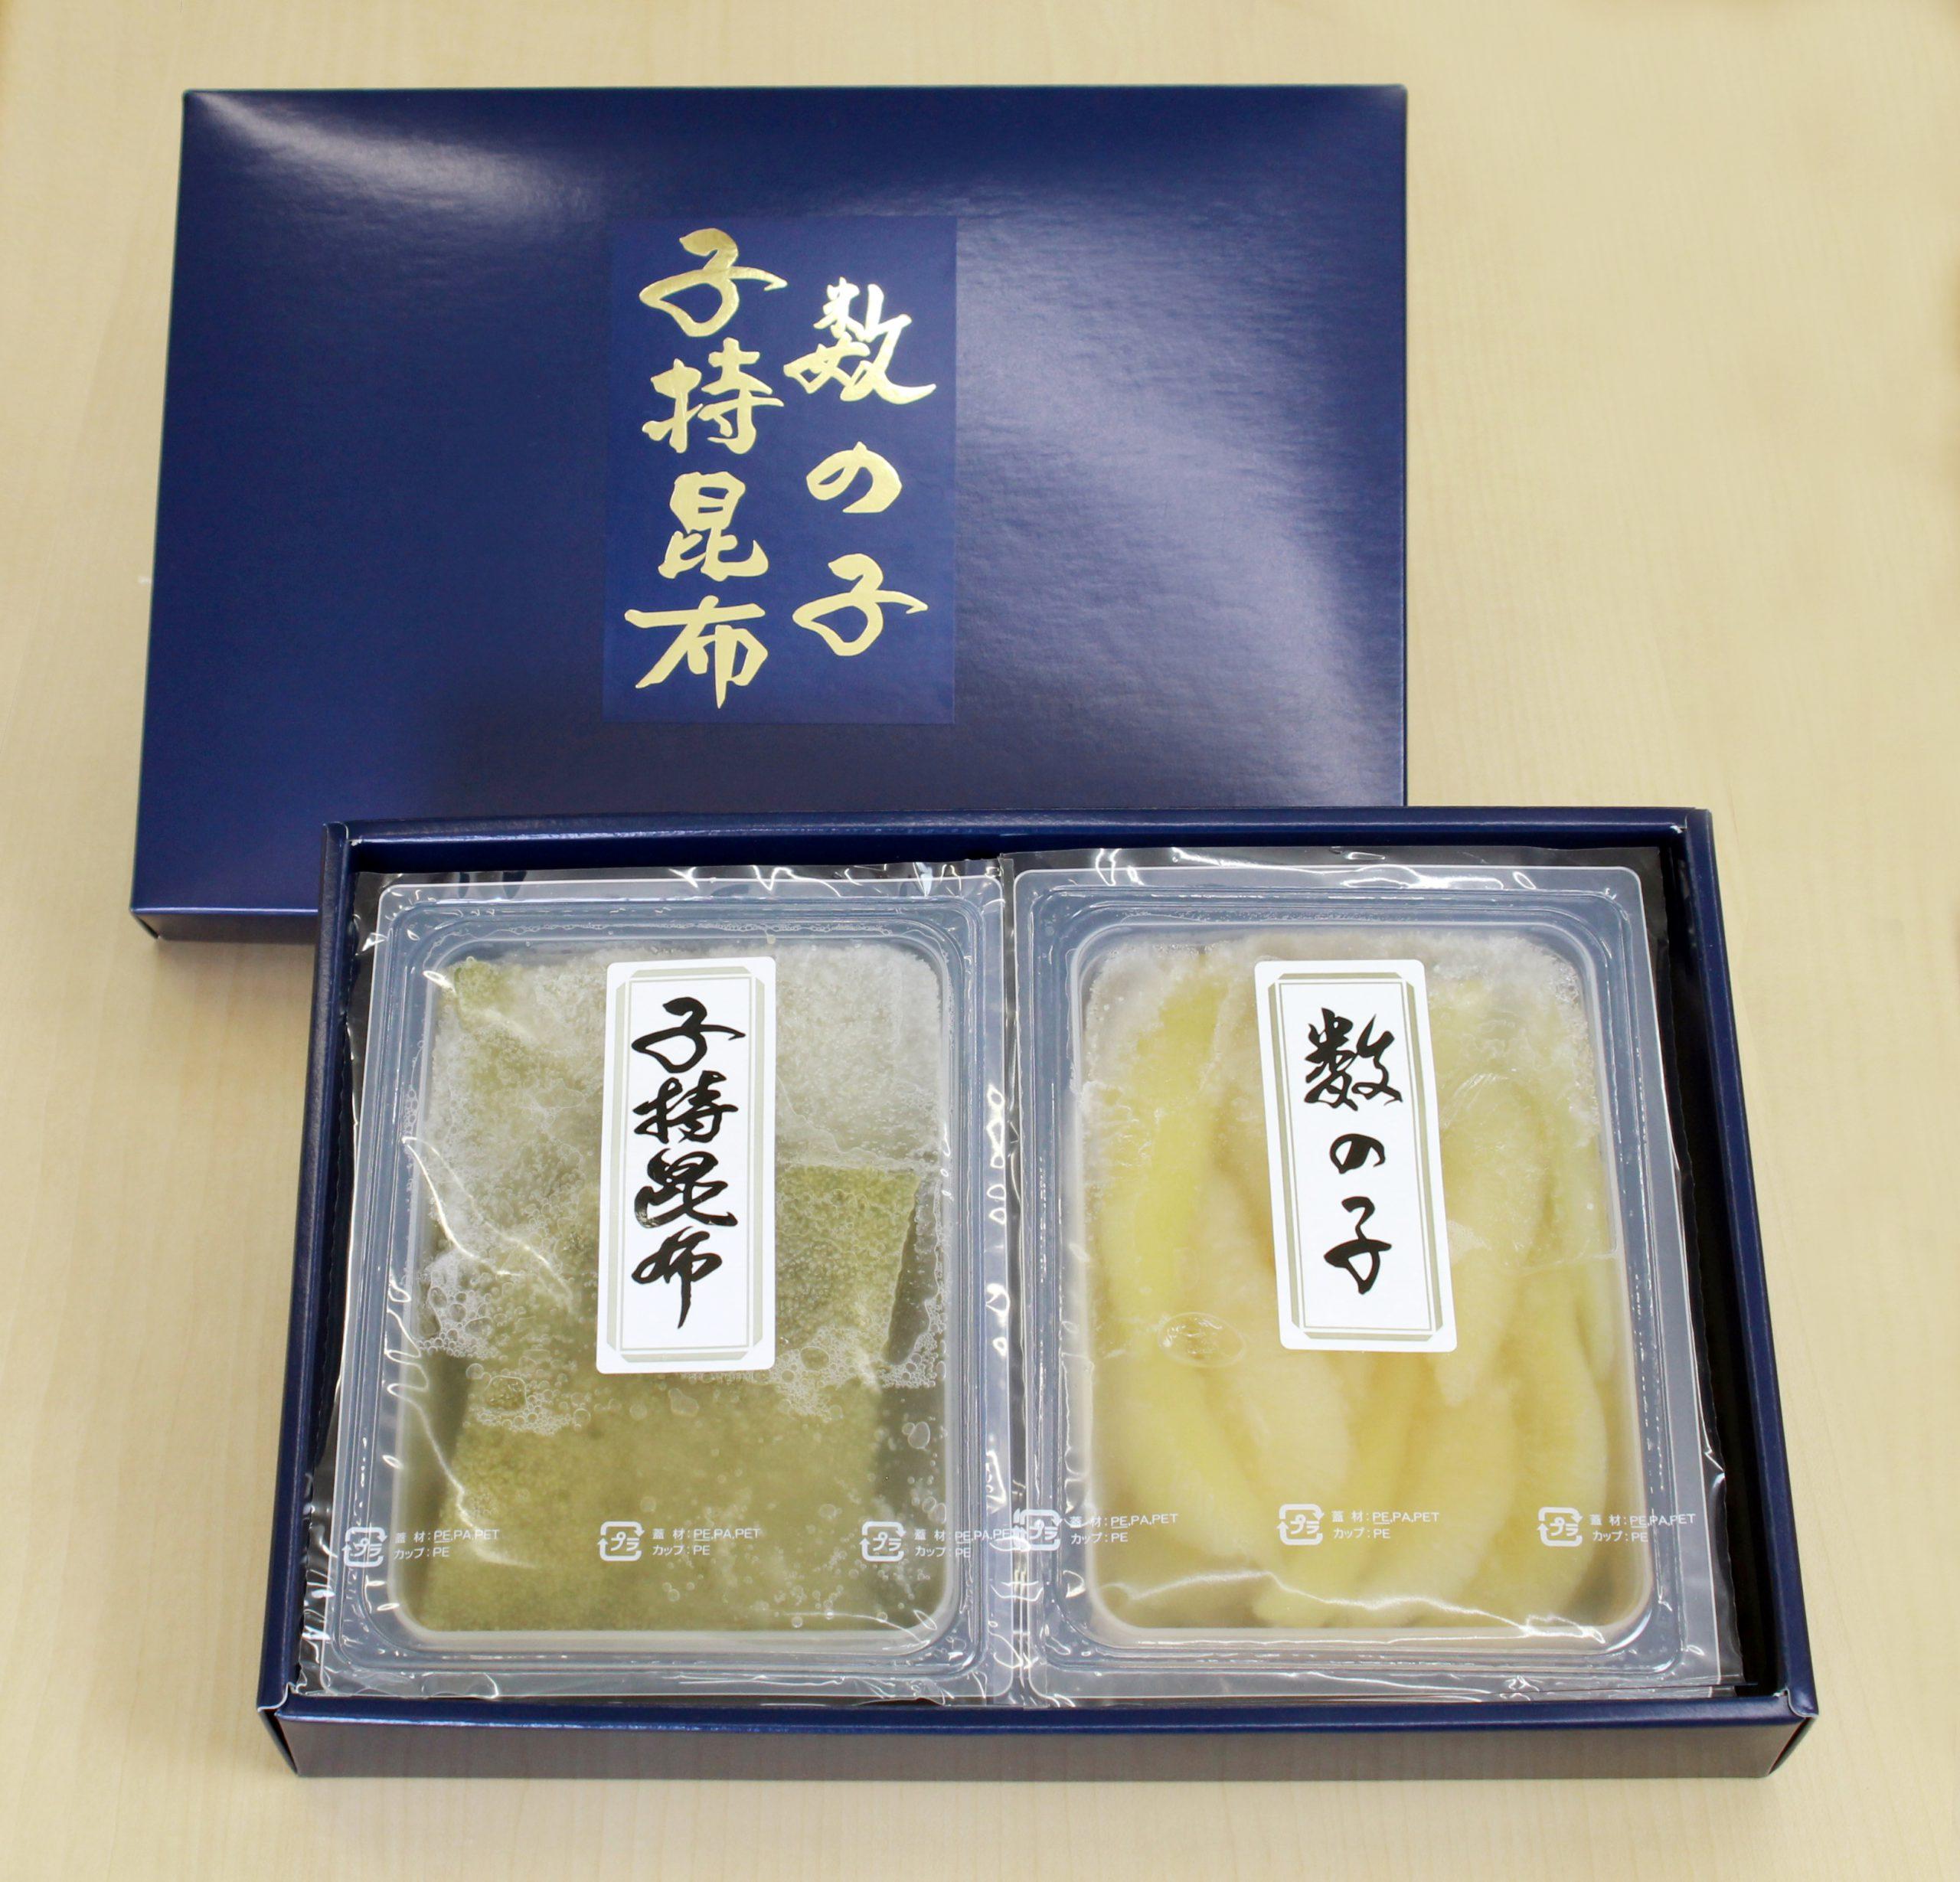 https://shop.gyorankobo.jp/wp-content/uploads/2020/04/IMG_7691-scaled.jpg